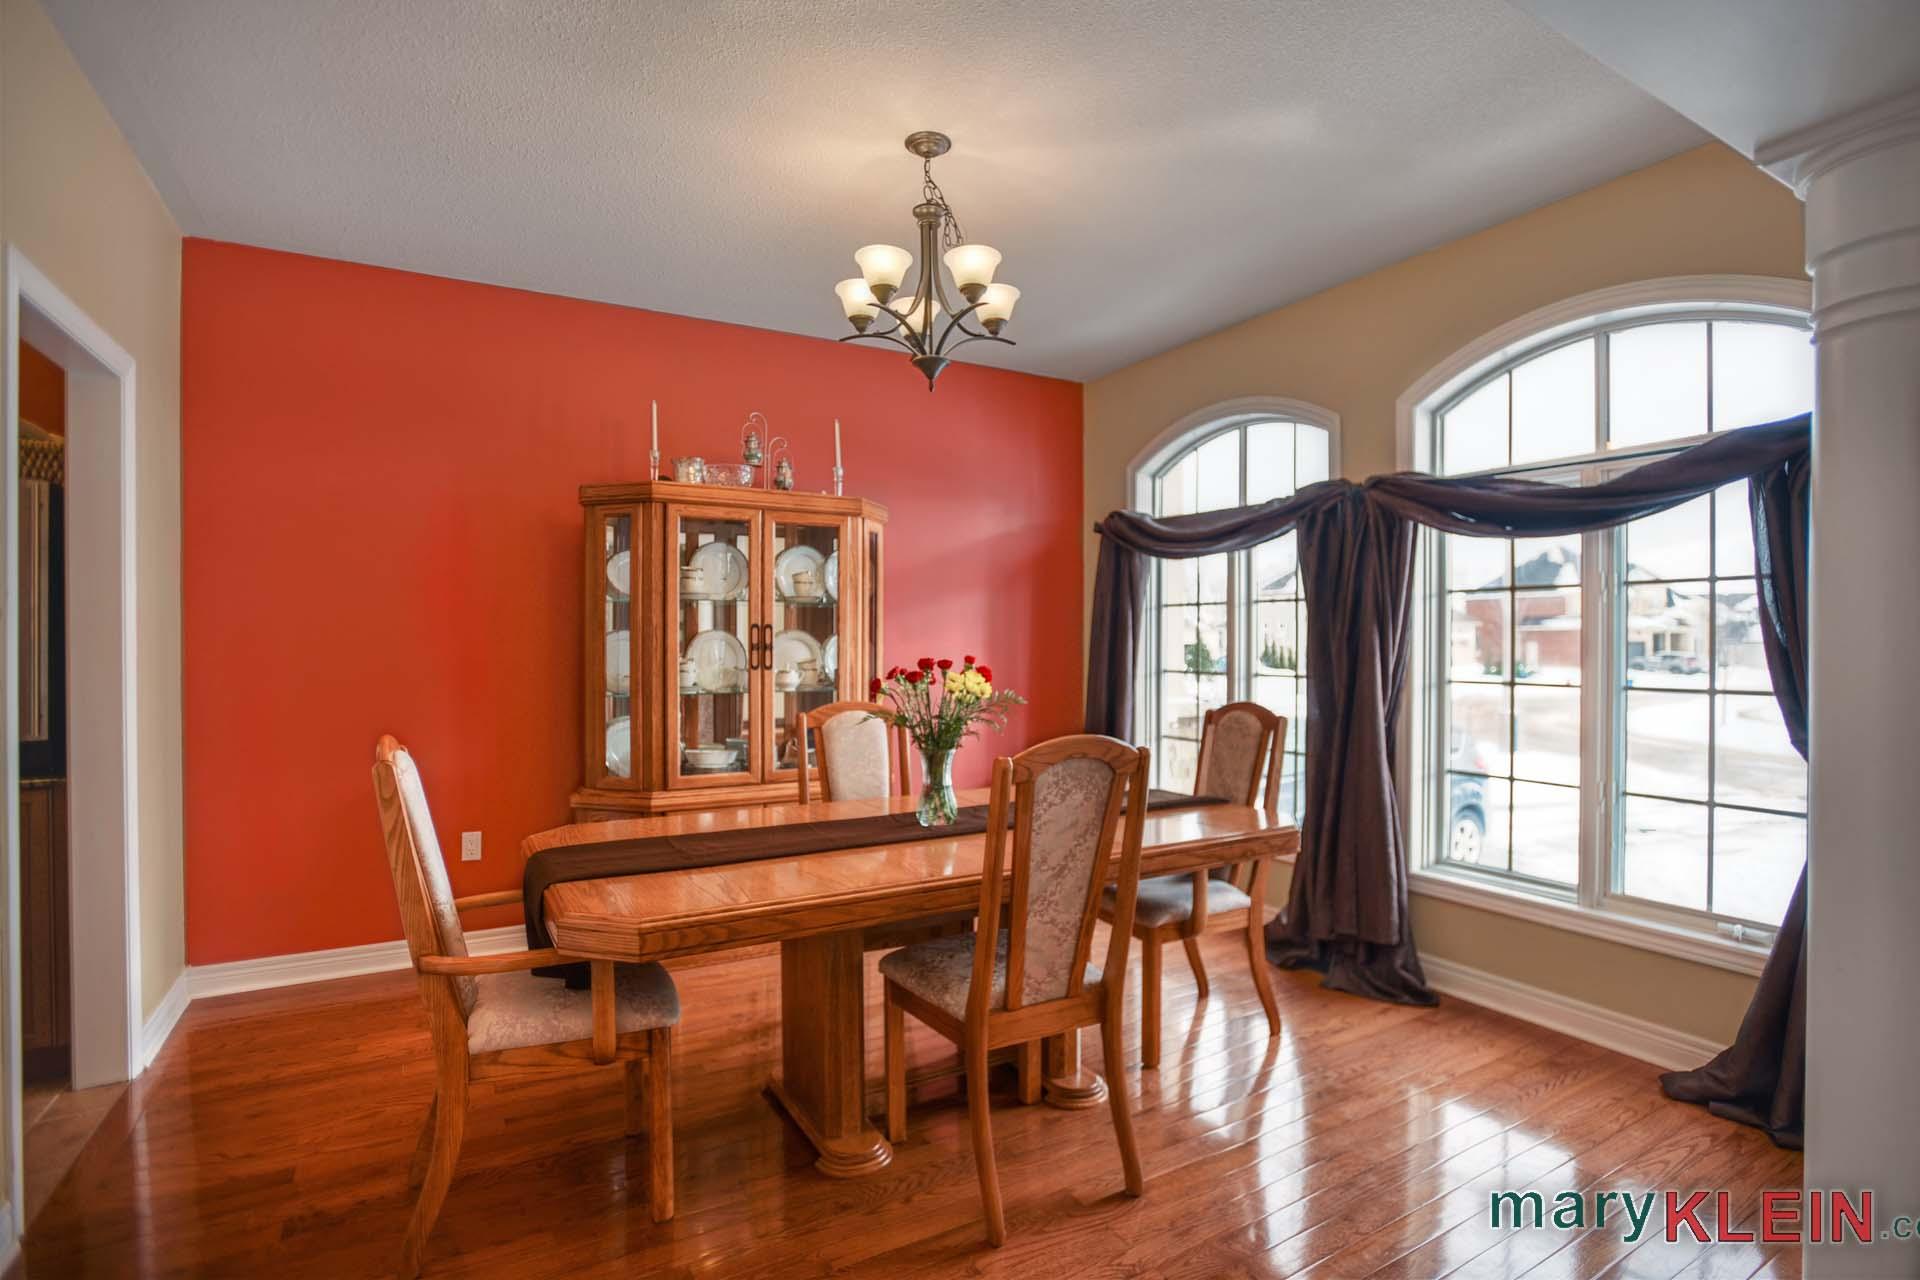 Dining Room, Servery